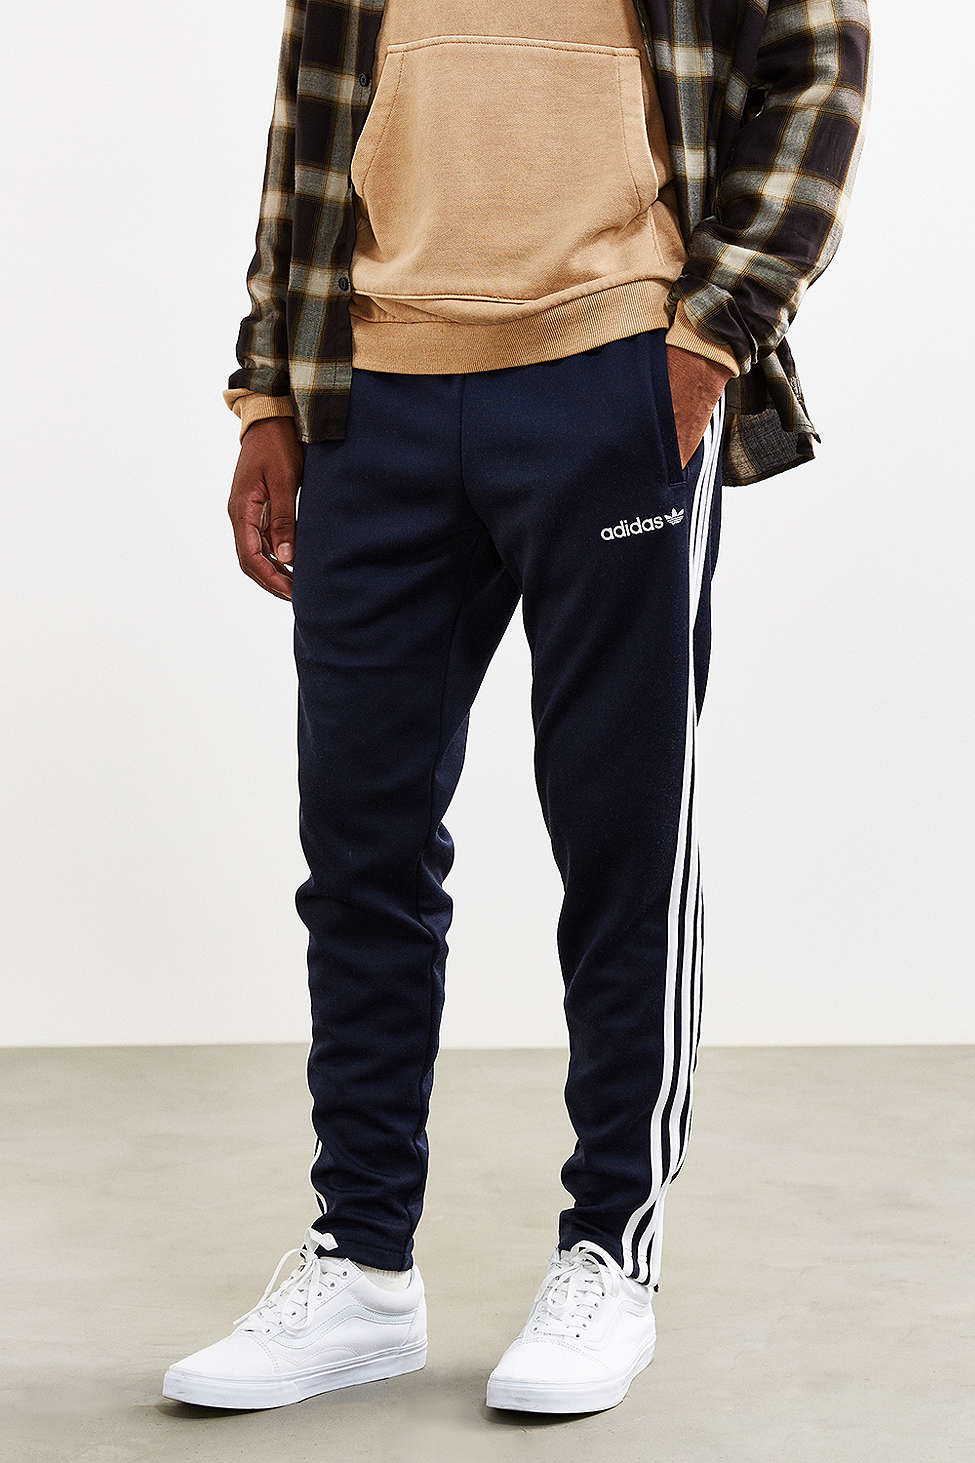 Adidas originali + 60) track pantaloni in blu per gli uomini lyst